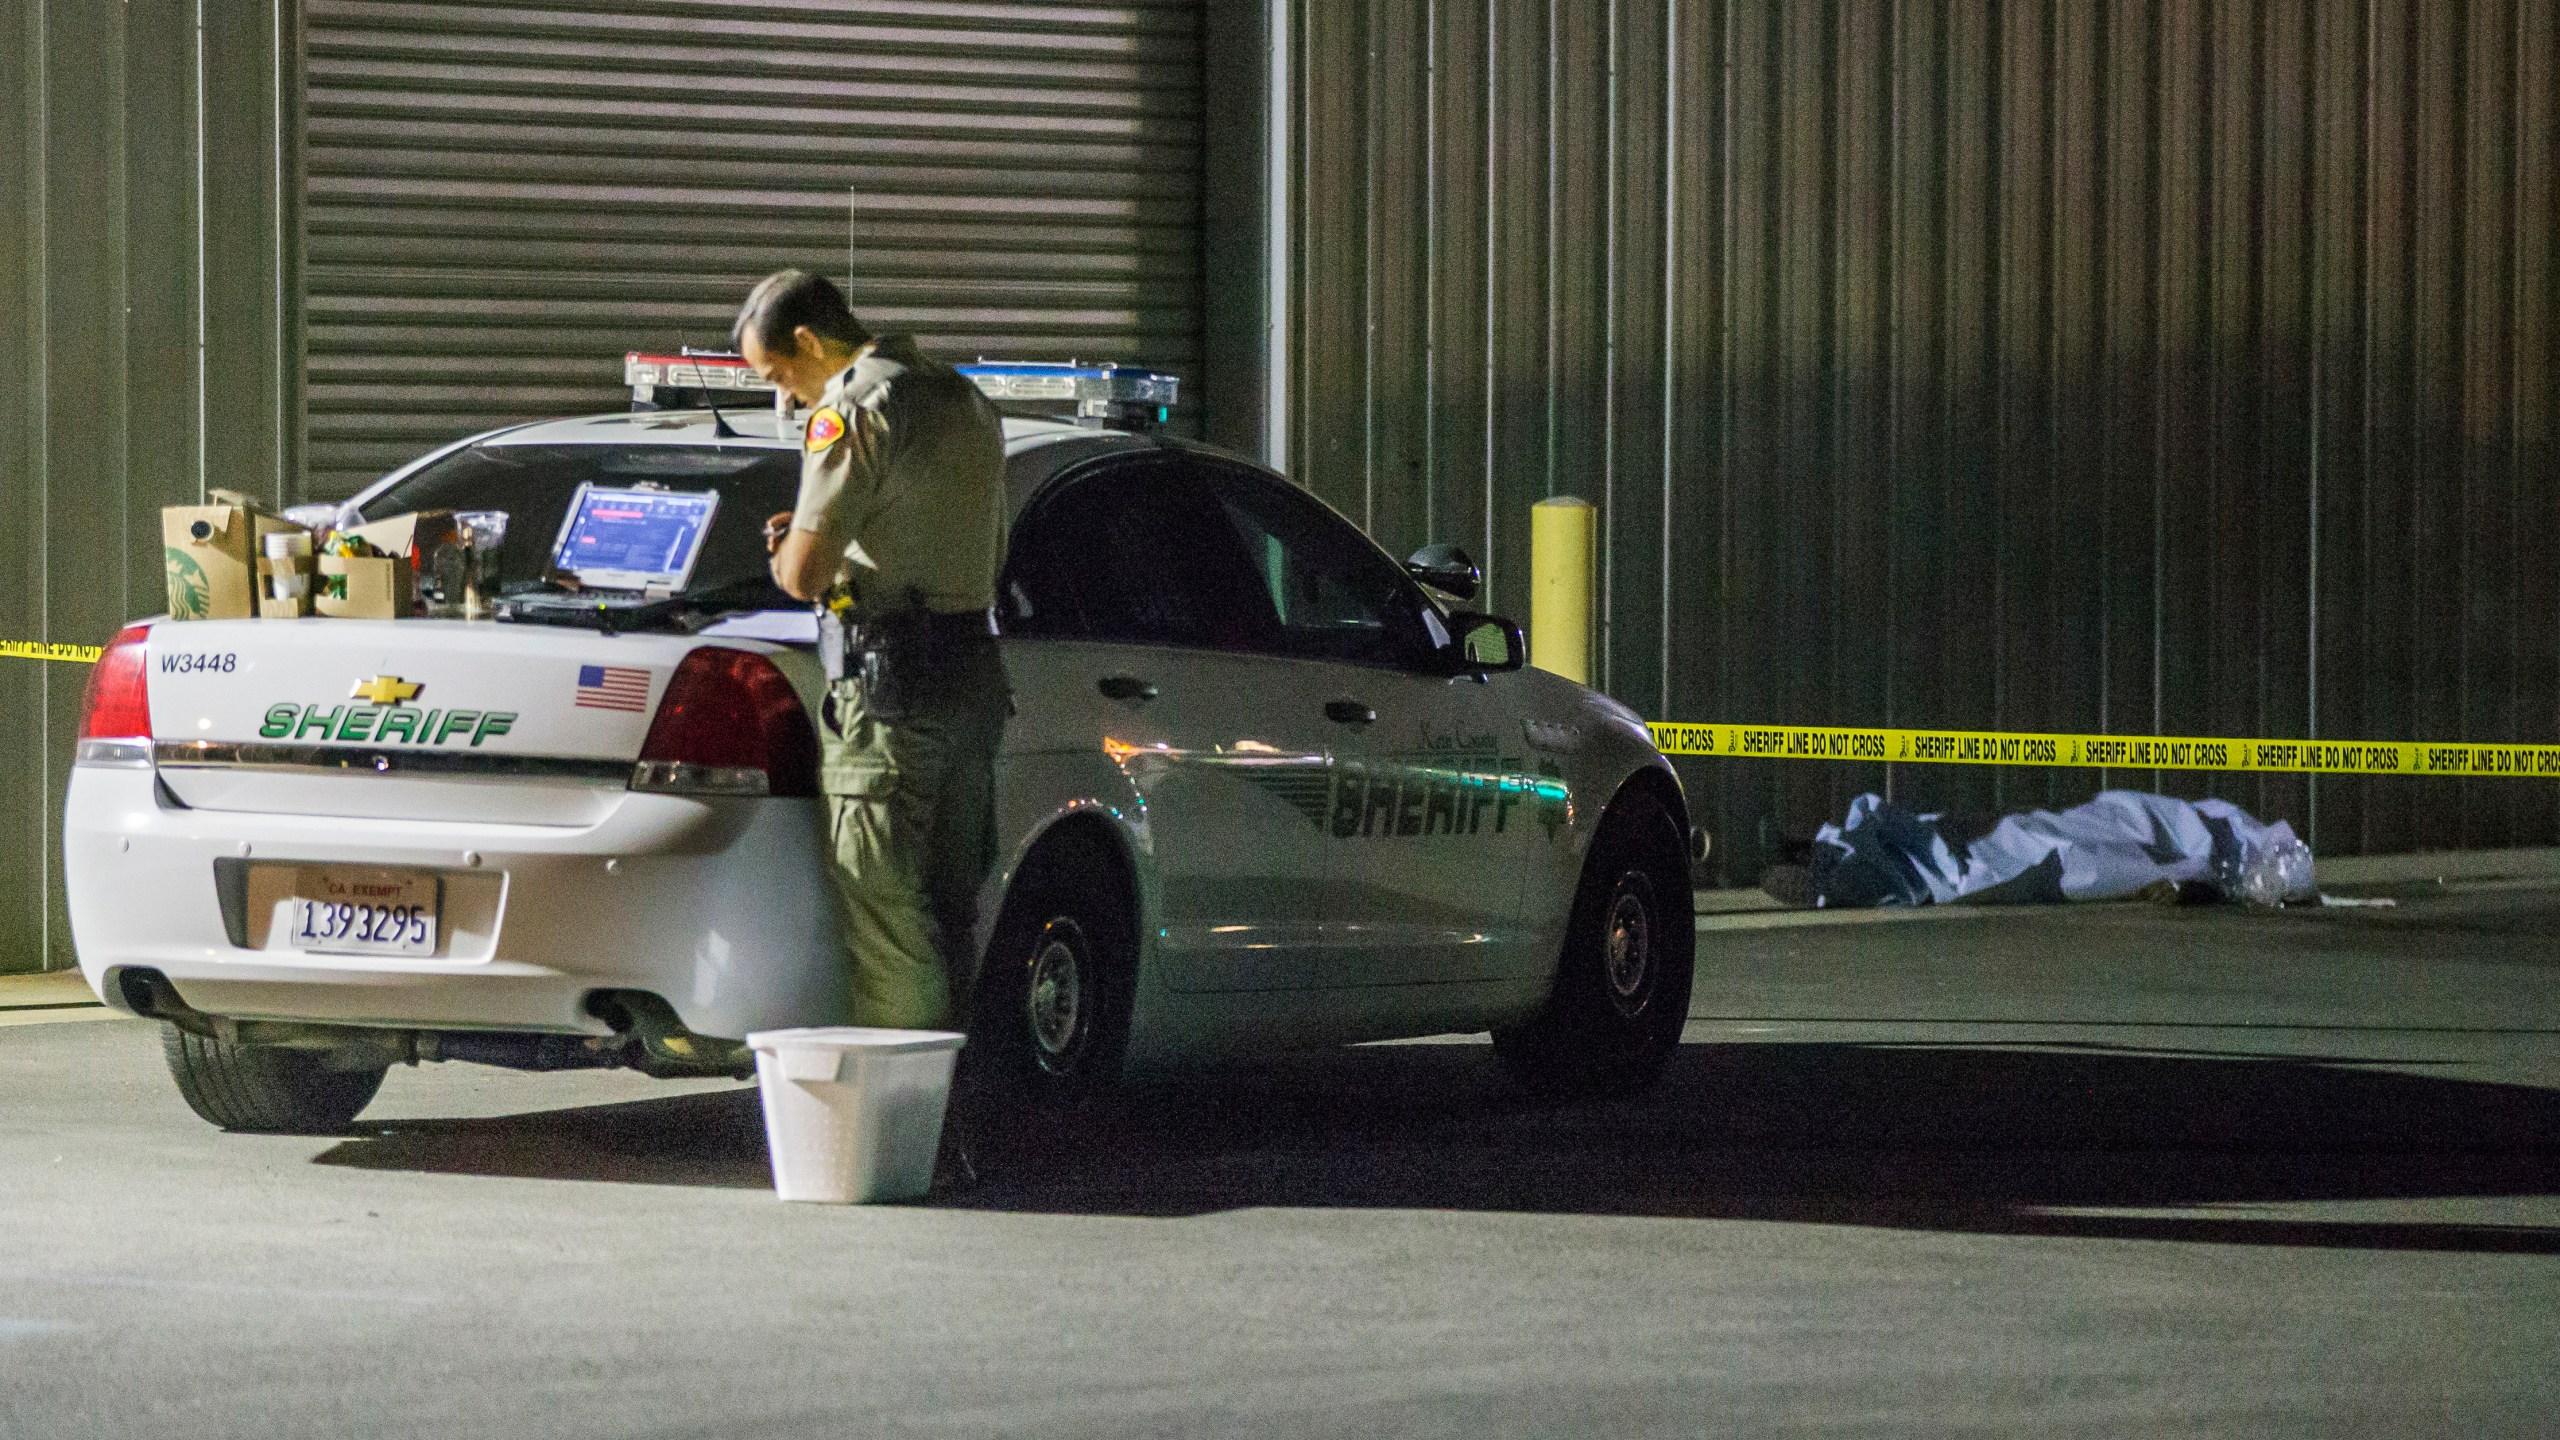 APTOPIX_California_Five_Killed_47067-159532.jpg40848722